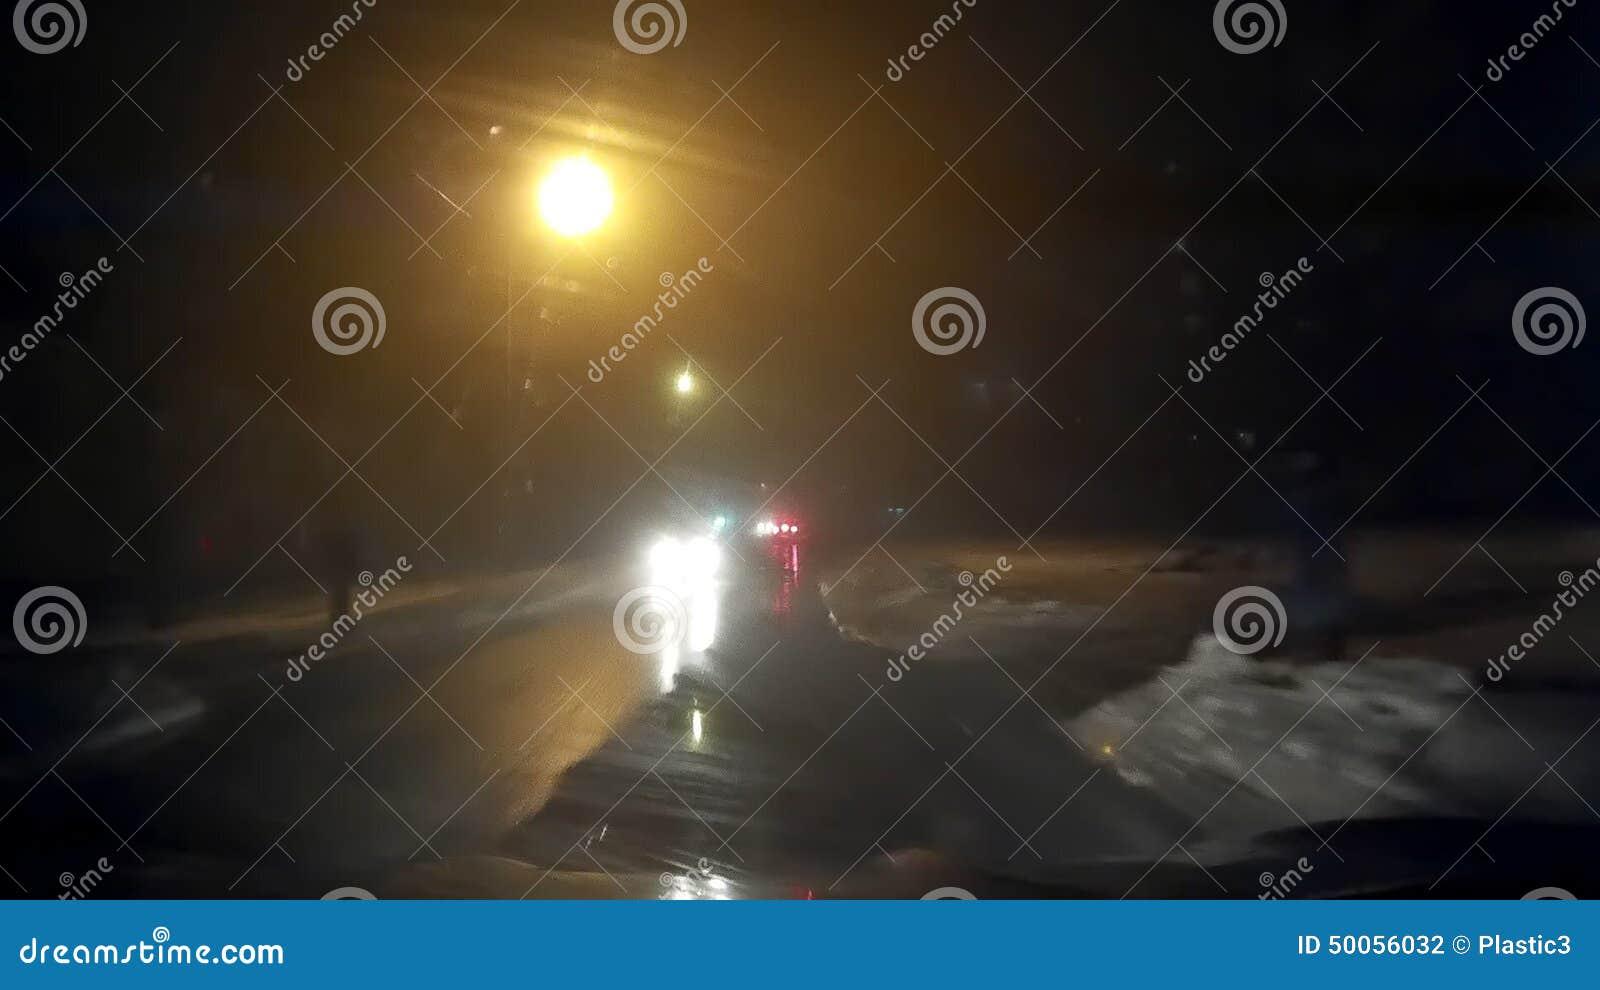 Night Foggy Mist Car Road Hd 2 Stock Footage - Video of mist